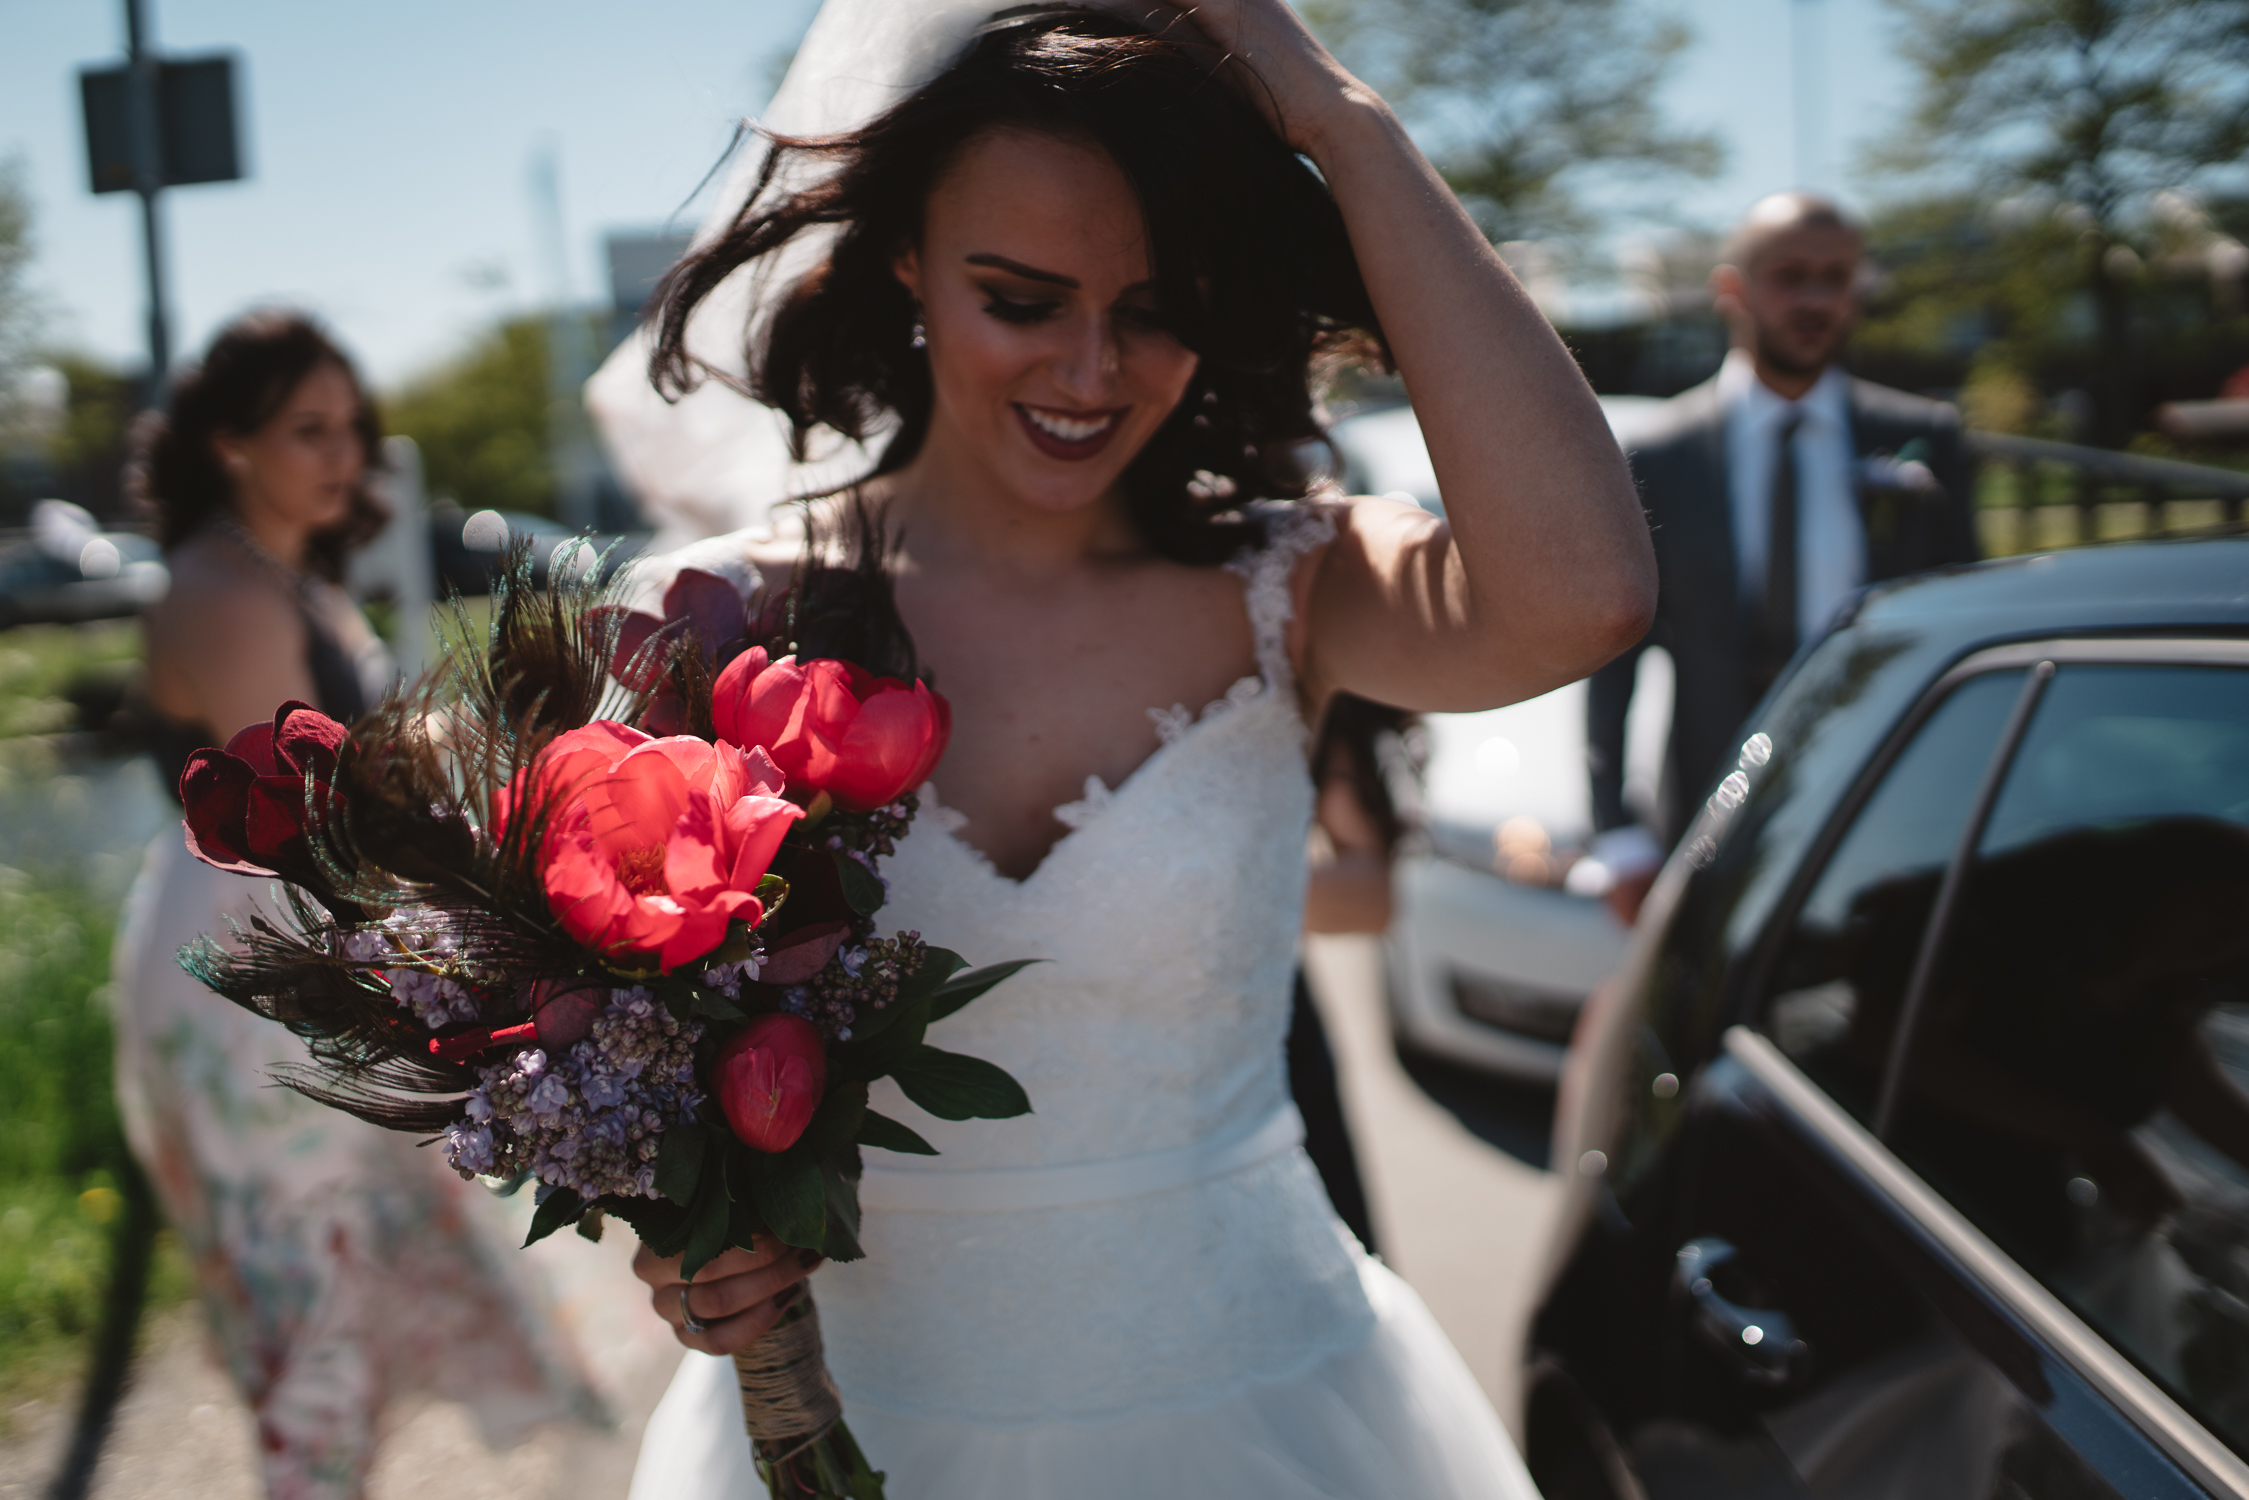 amsterdam wedding photography by mark hadden